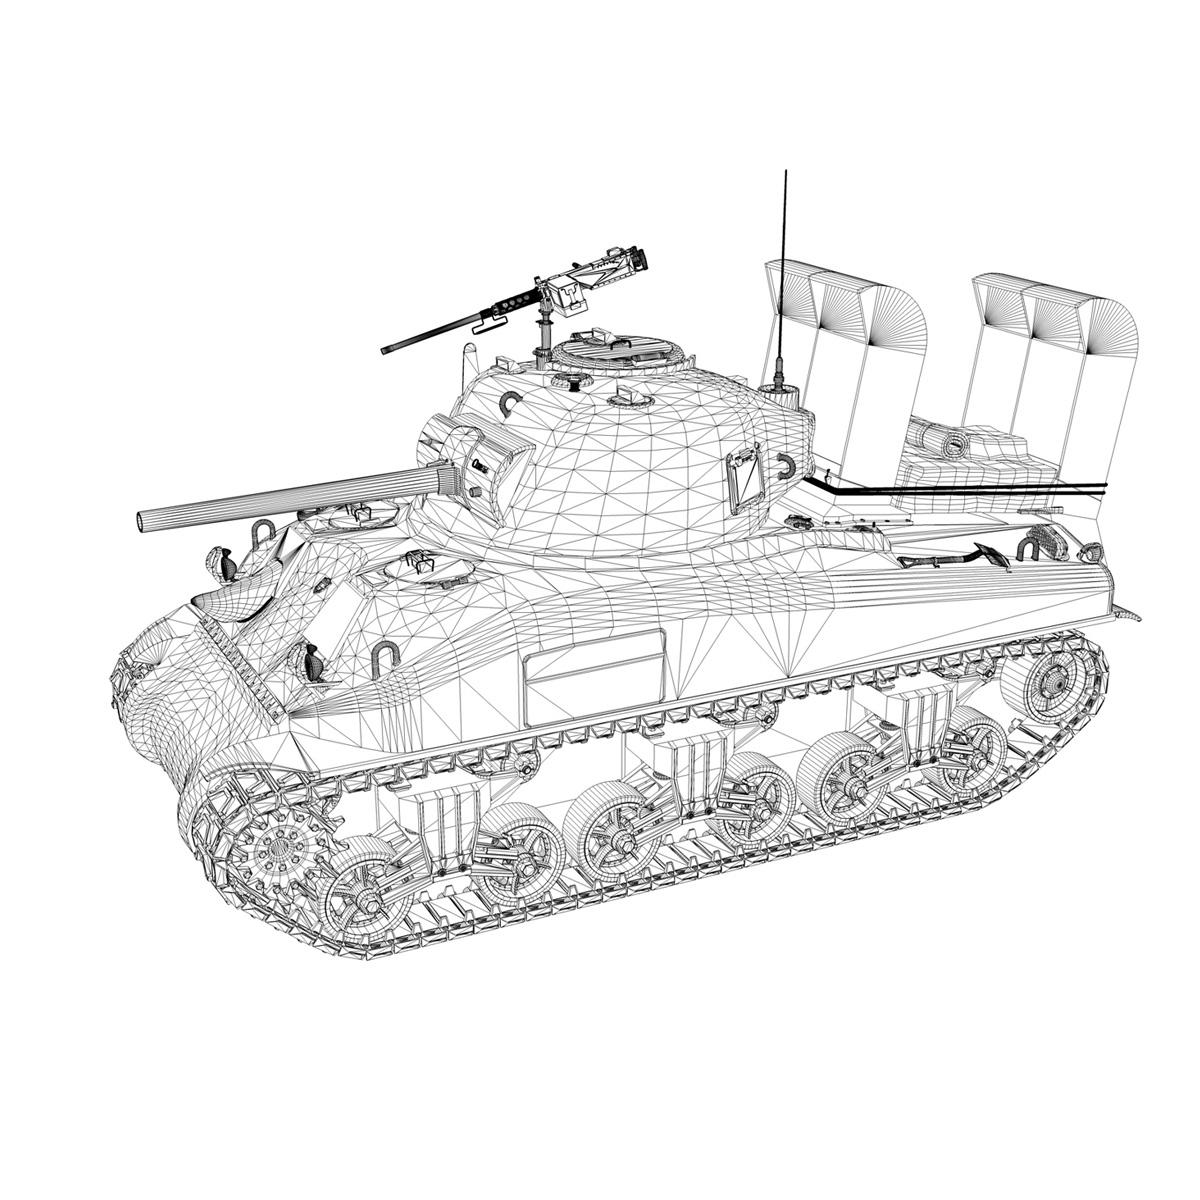 M4A1 Sherman - 16 3d model 3ds fbx c4d lwo lws lw obj 273061